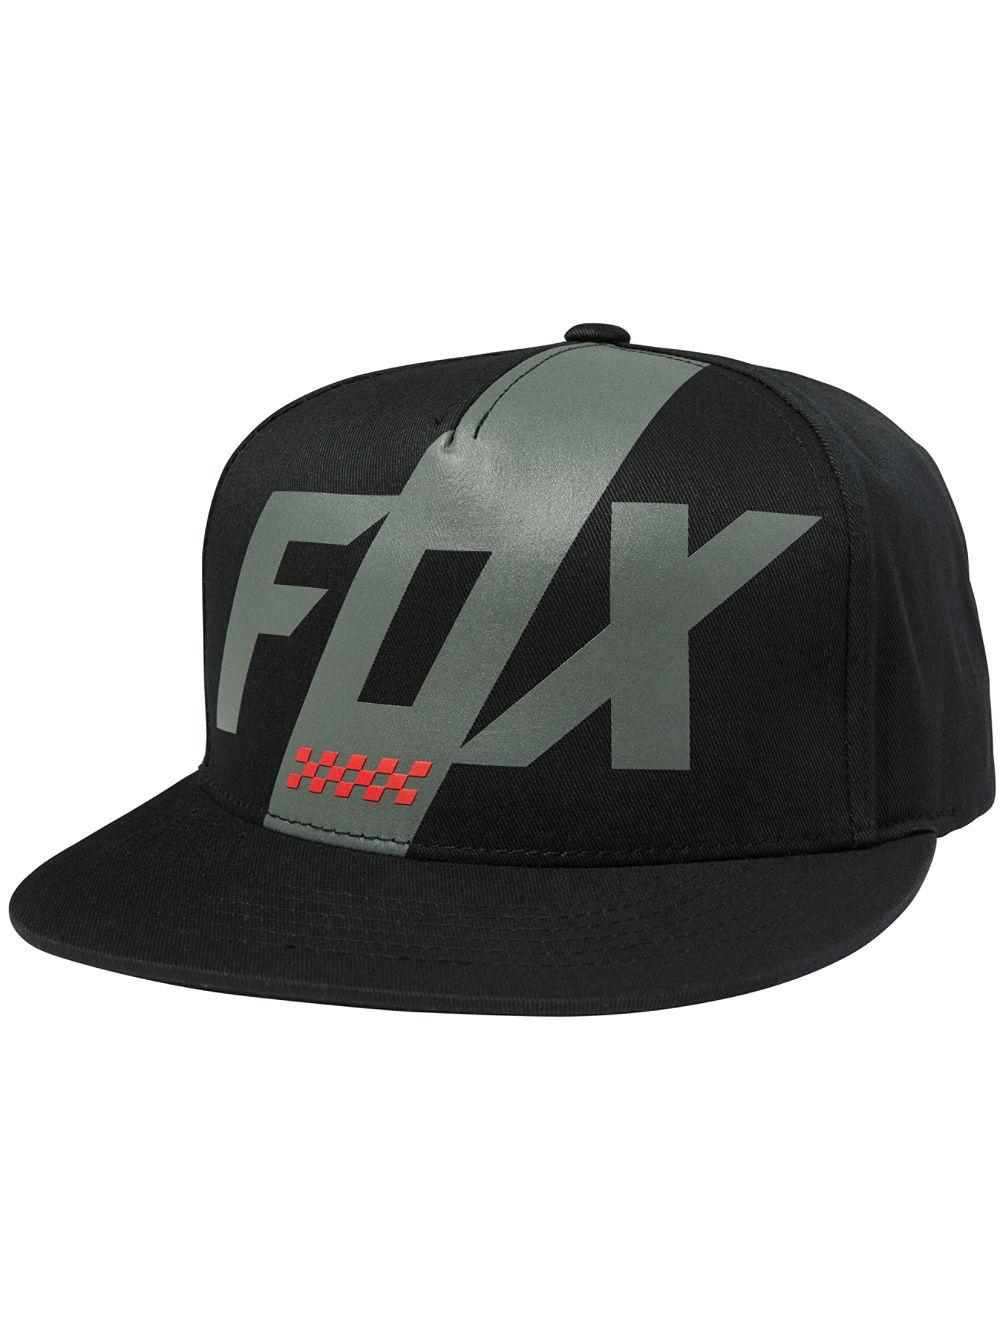 Compra Fox Scalene Snapback Gorra en línea en blue-tomato.com f03a113ea1e